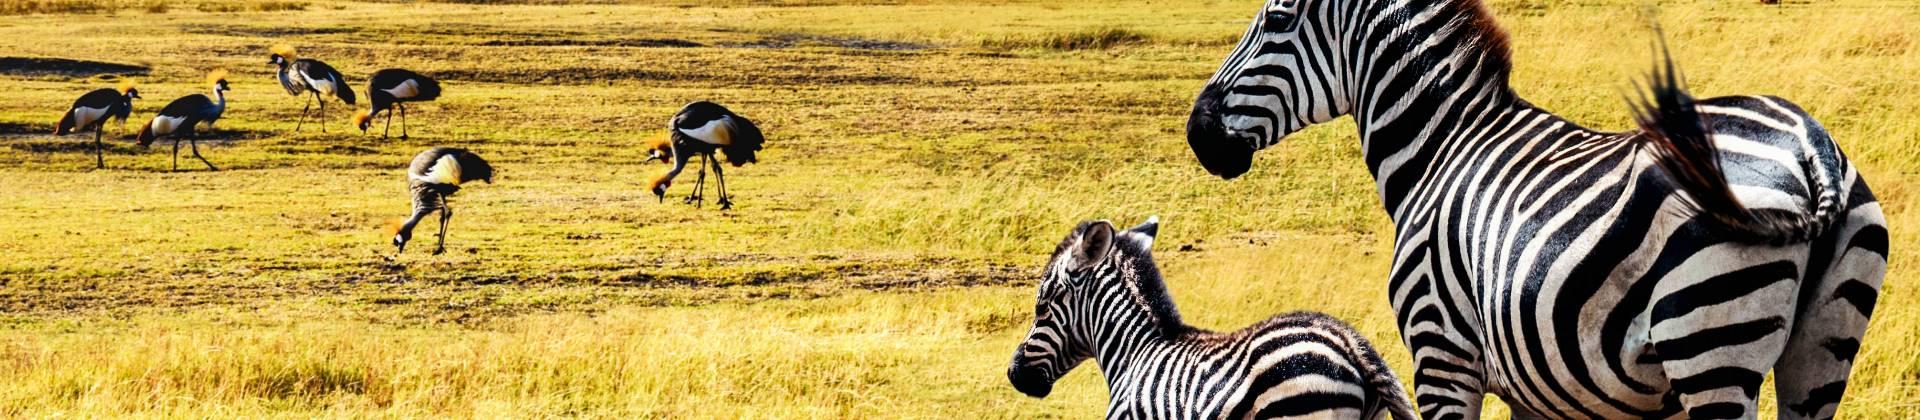 Beste Tansania Reisezeit